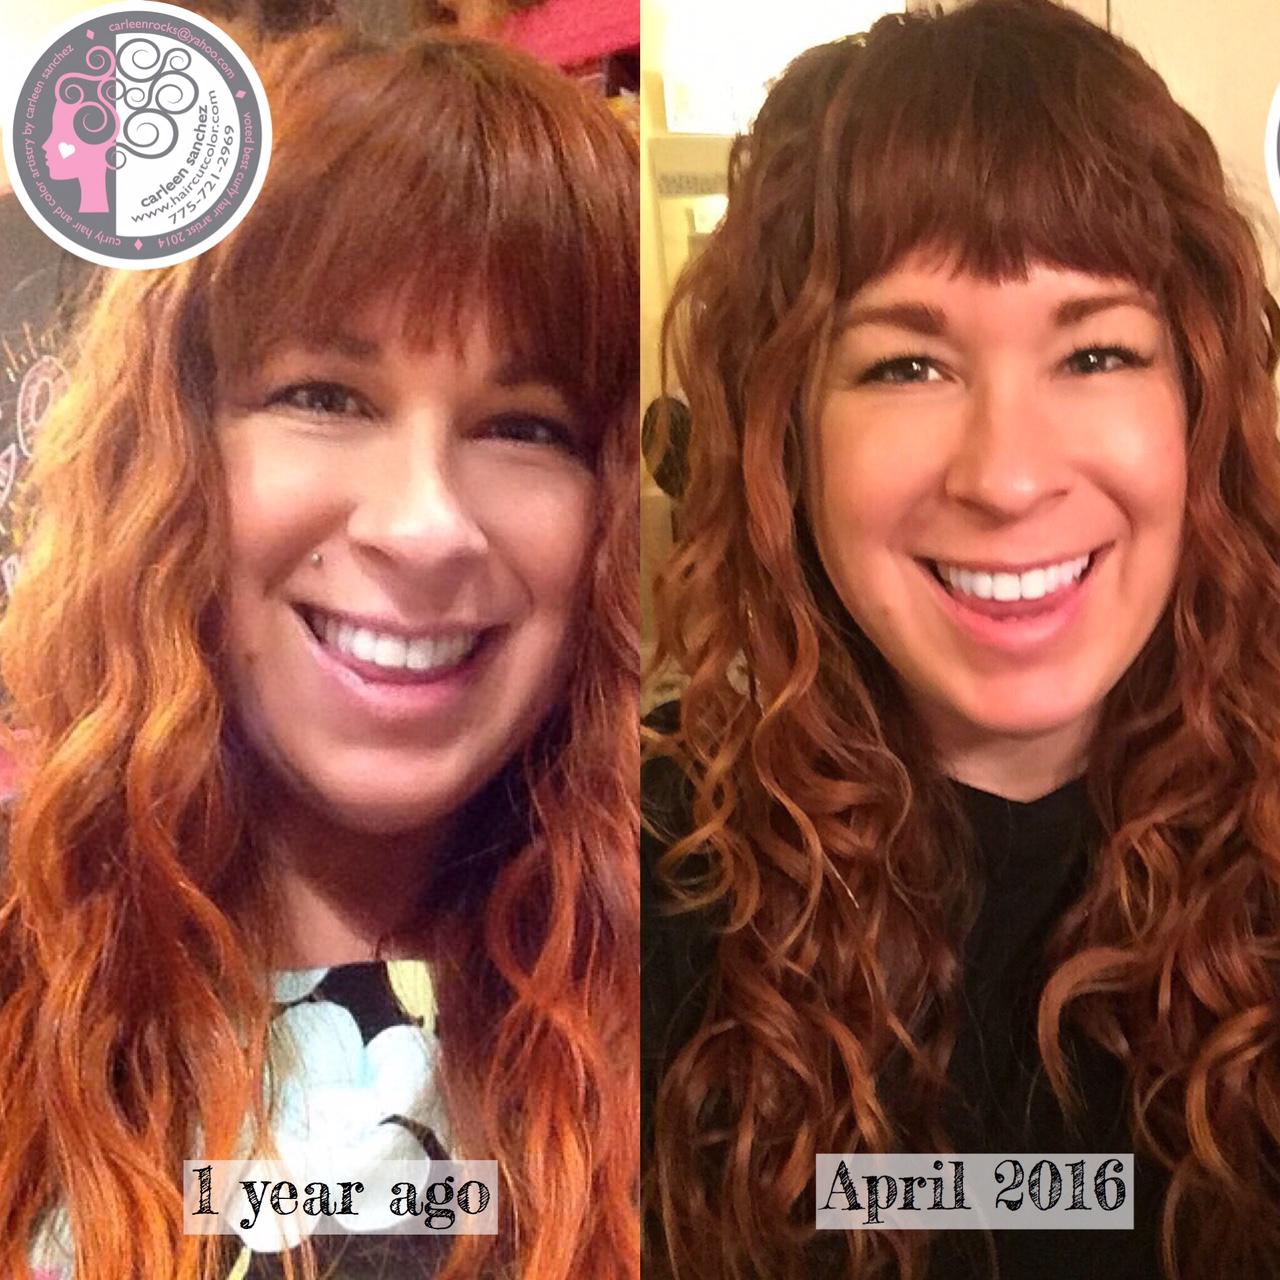 curly hair artist carleen sanchez reno nevada color expert wavy swavy coily salon specialist best